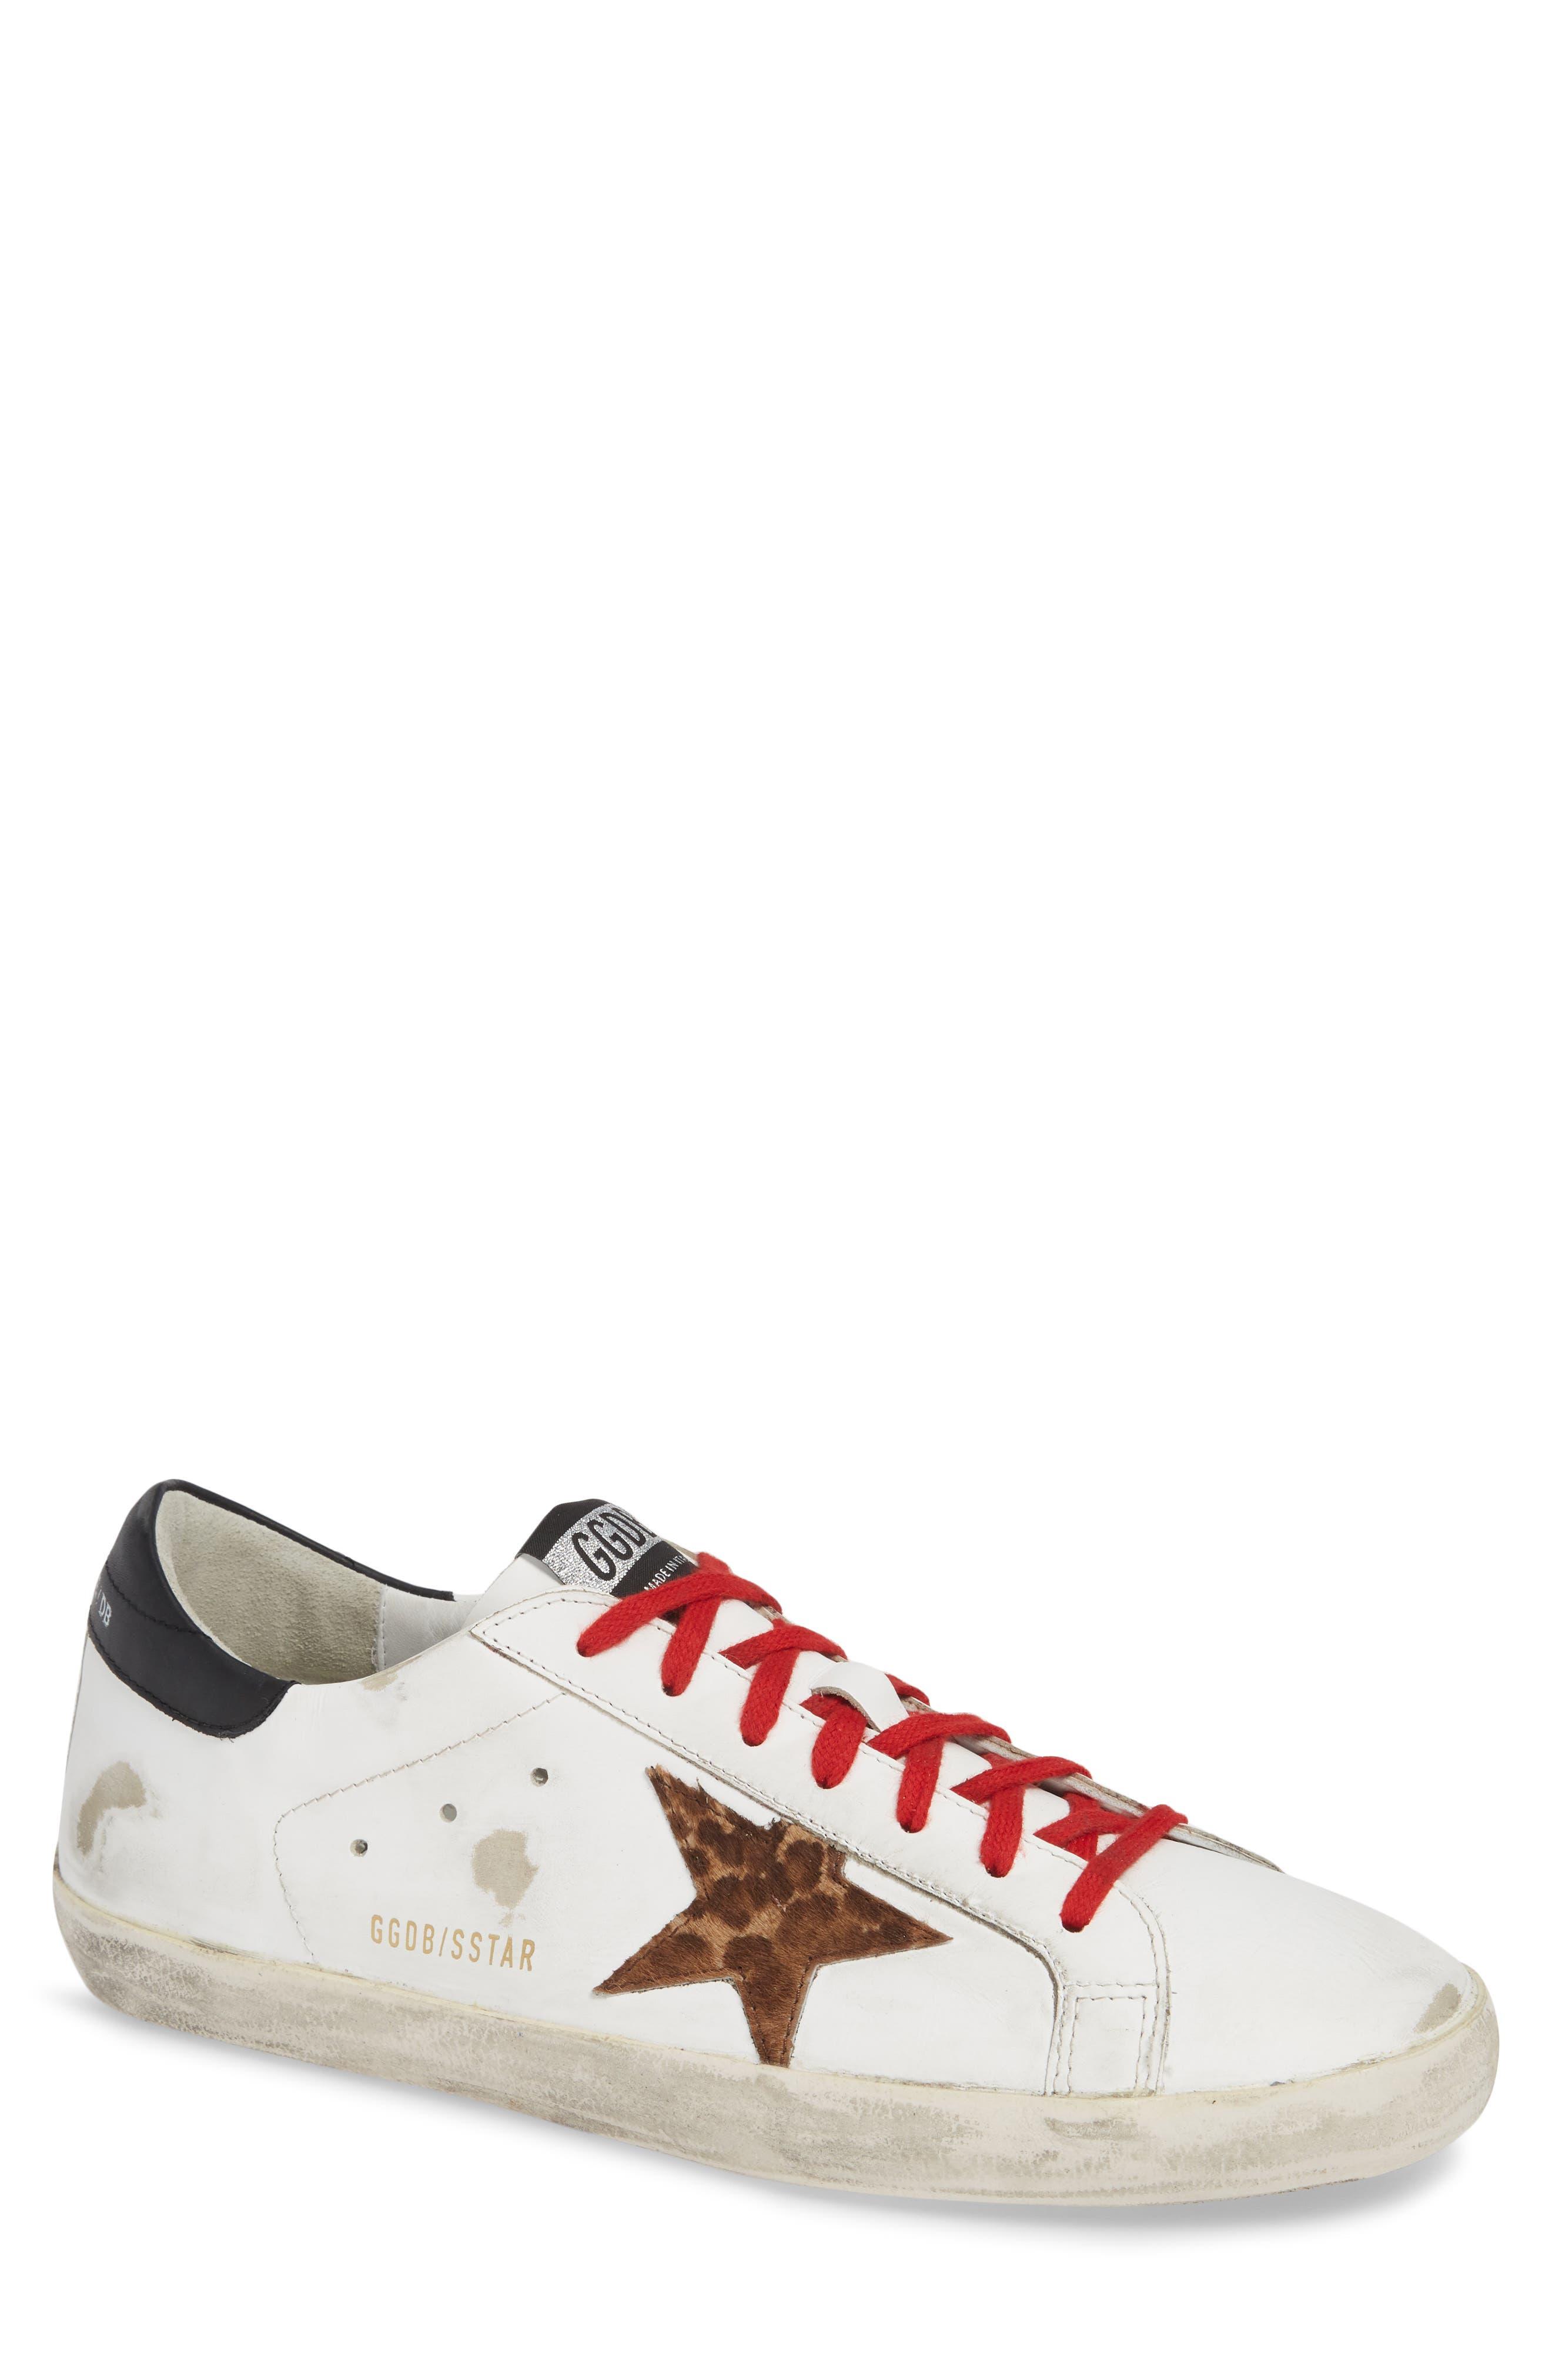 GOLDEN GOOSE 'Superstar' Sneaker, Main, color, WHITE/ BLACK